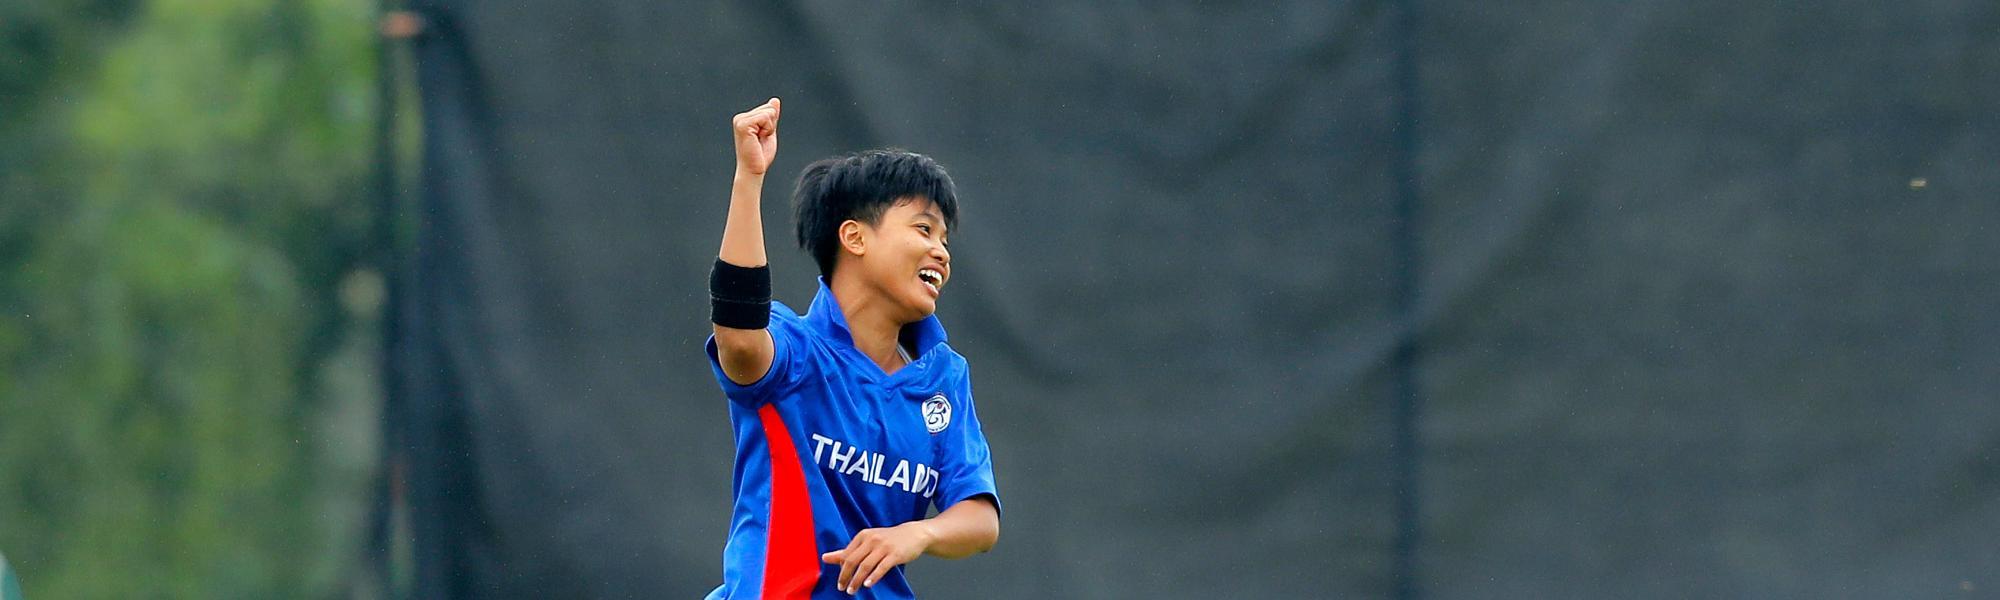 Thailand Bowler Boochatham celebrates the dismissal of Scotland Batsman Lorna Jack, 9th Match, Group B, ICC Women's World Twenty20 Qualifier at Utrecht, Jul 10th 2018.